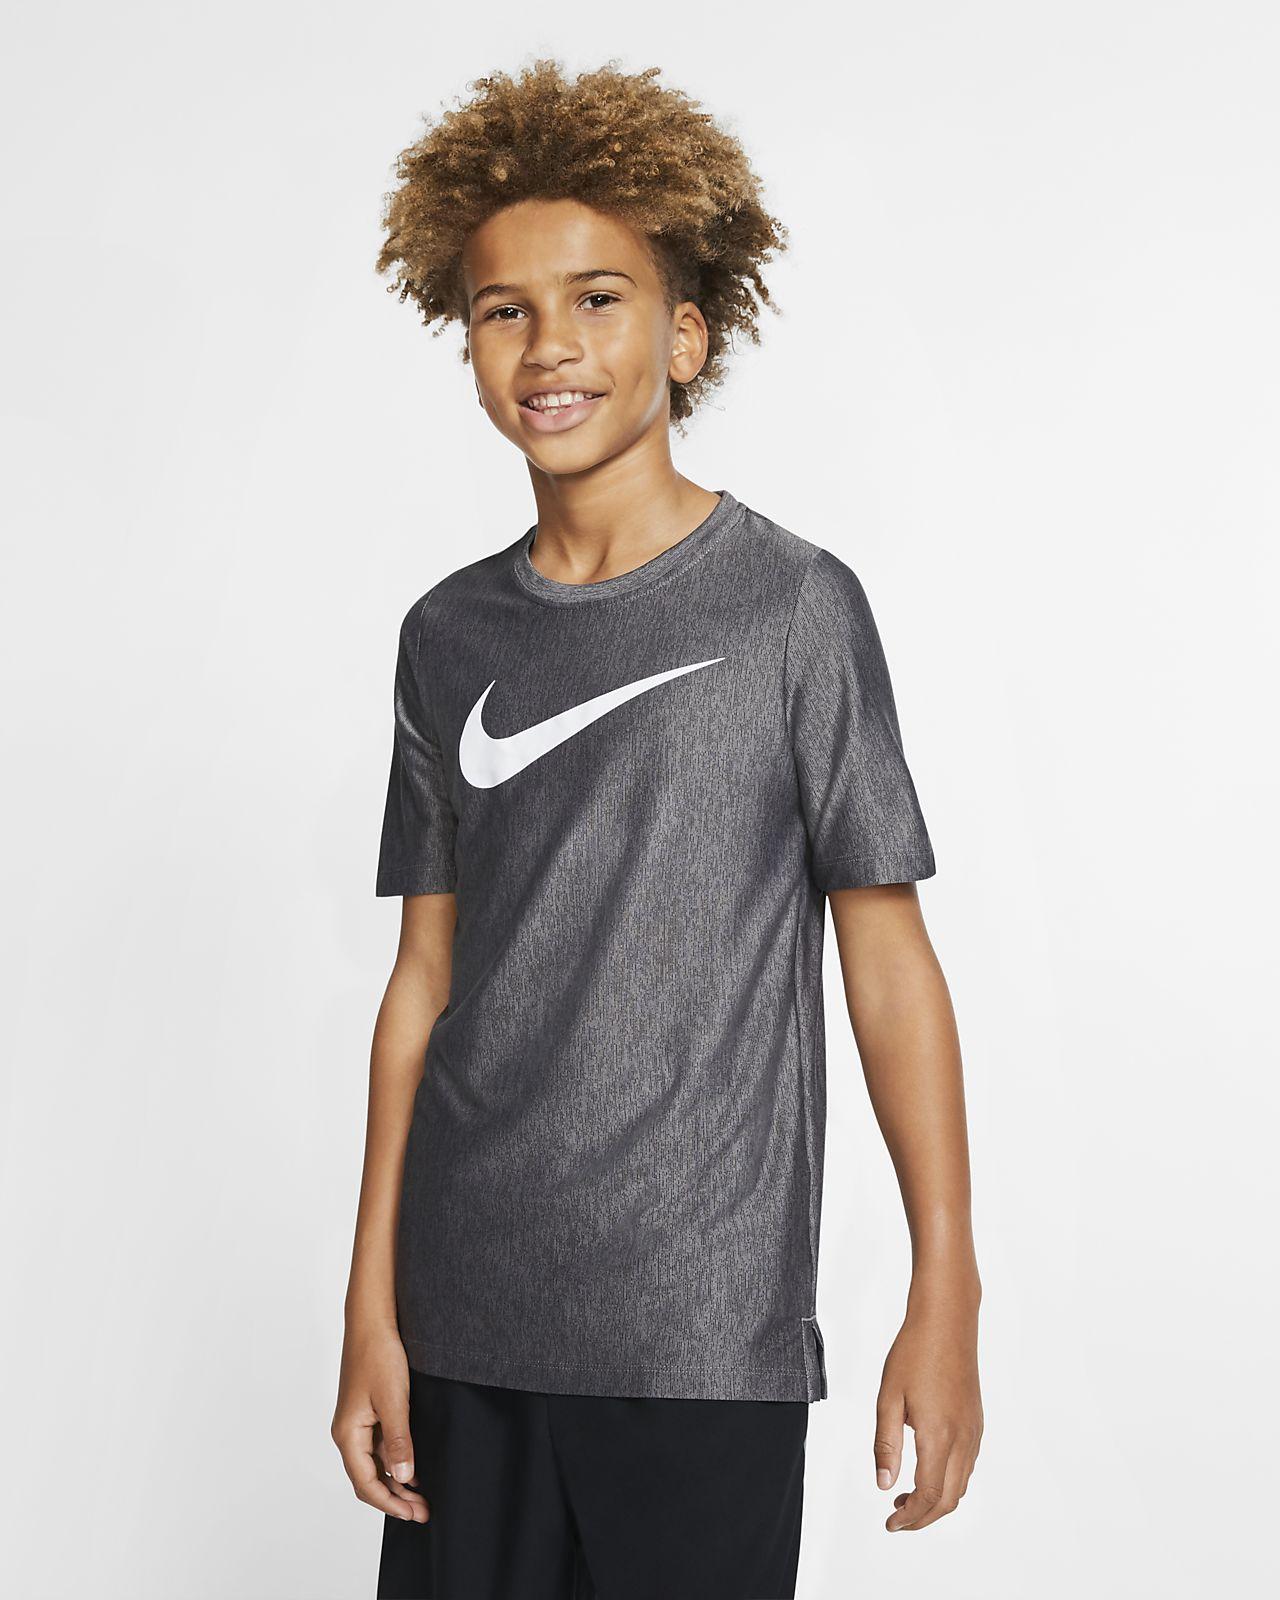 Nike Dri-FIT大童(男孩)短袖训练上衣